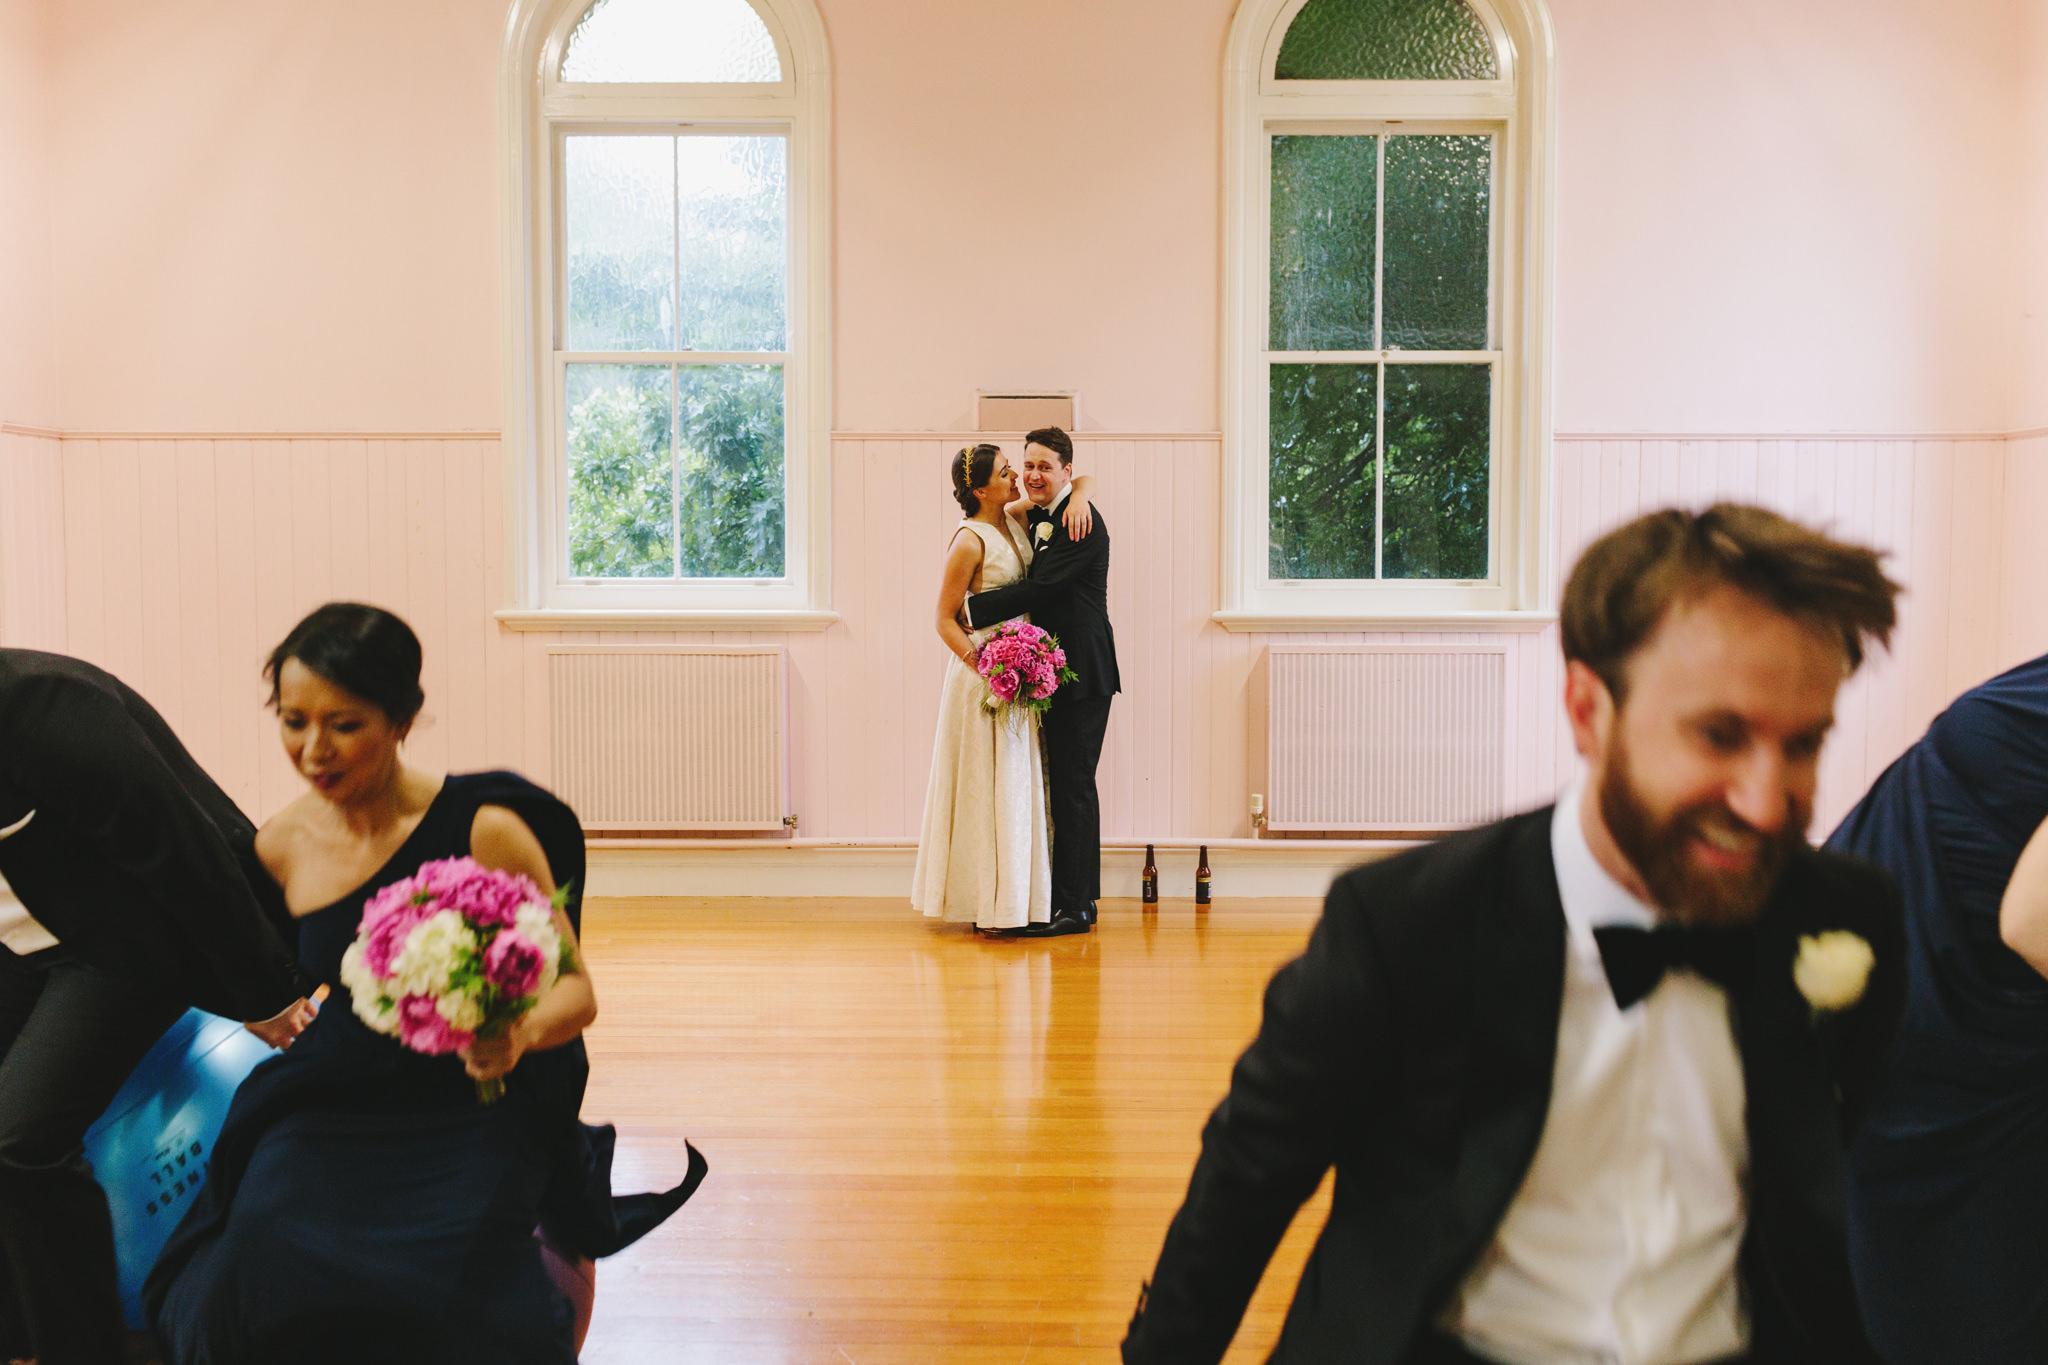 Abbotsford_Convent_Wedding_Peter_Anna086.JPG